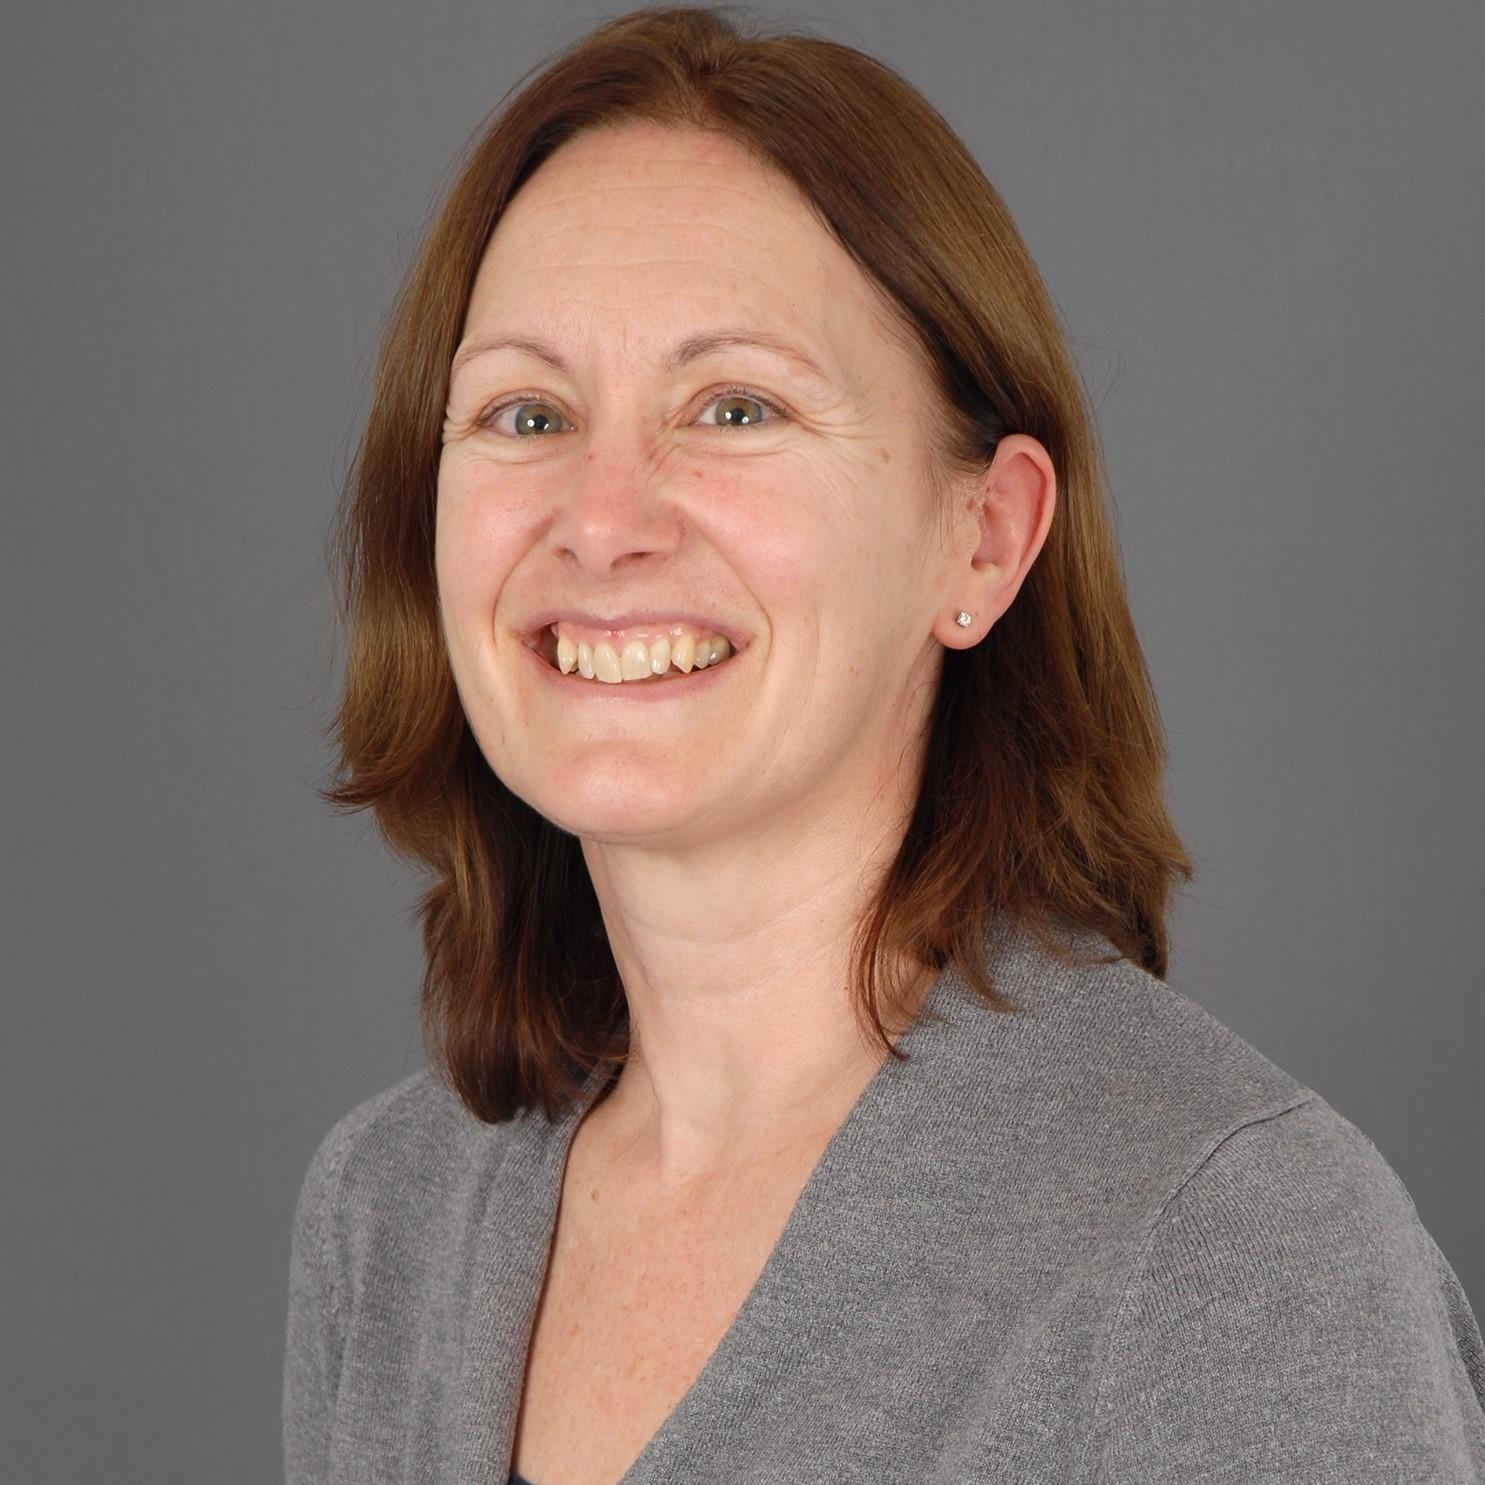 Prof. Katherine Denby